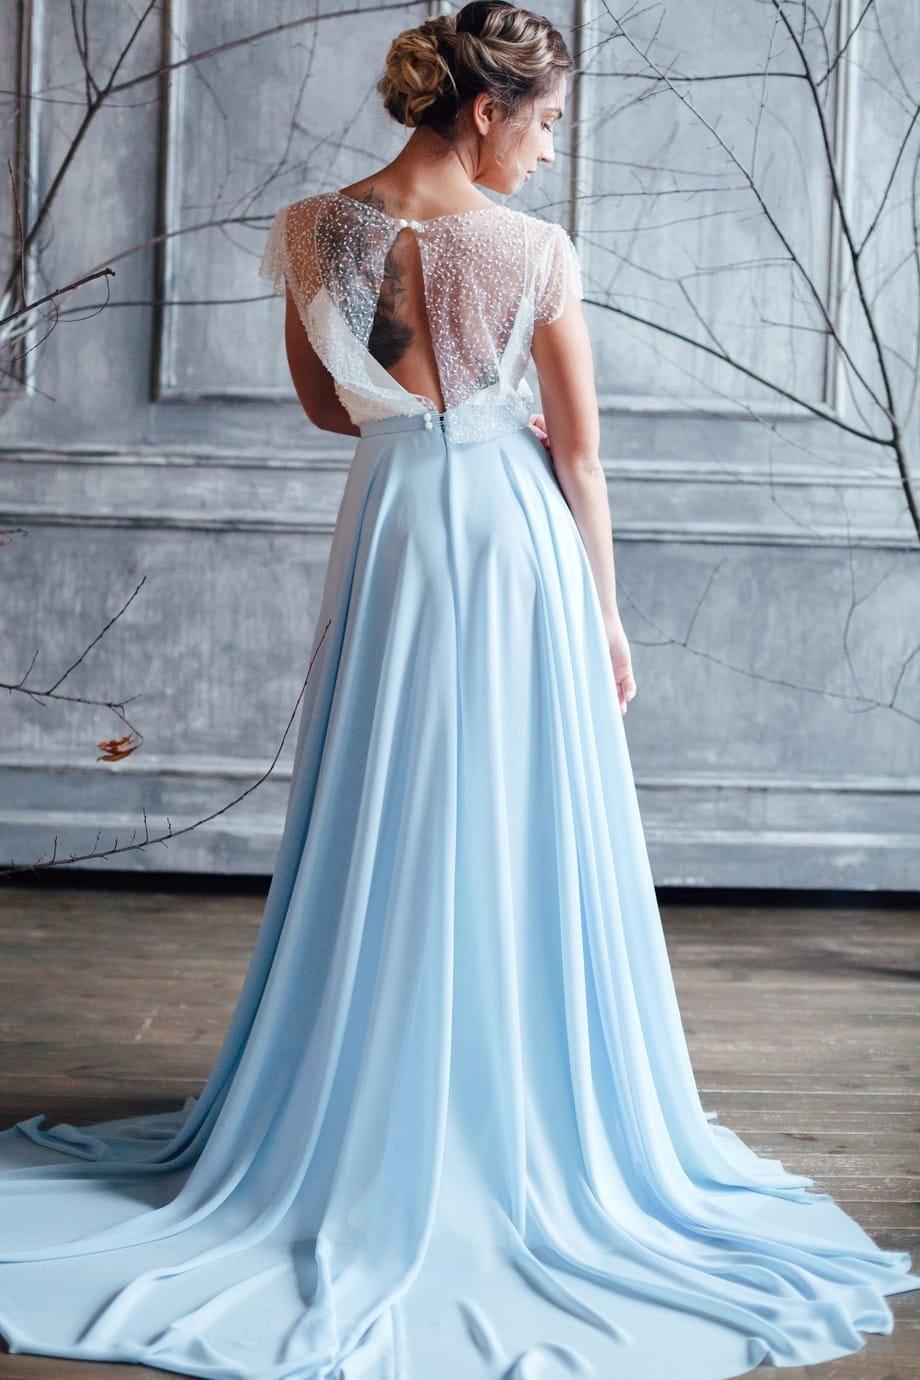 Вечернее платье ISLA, коллекция FLOWER MAGIC, бренд RARE BRIDAL, фото 3